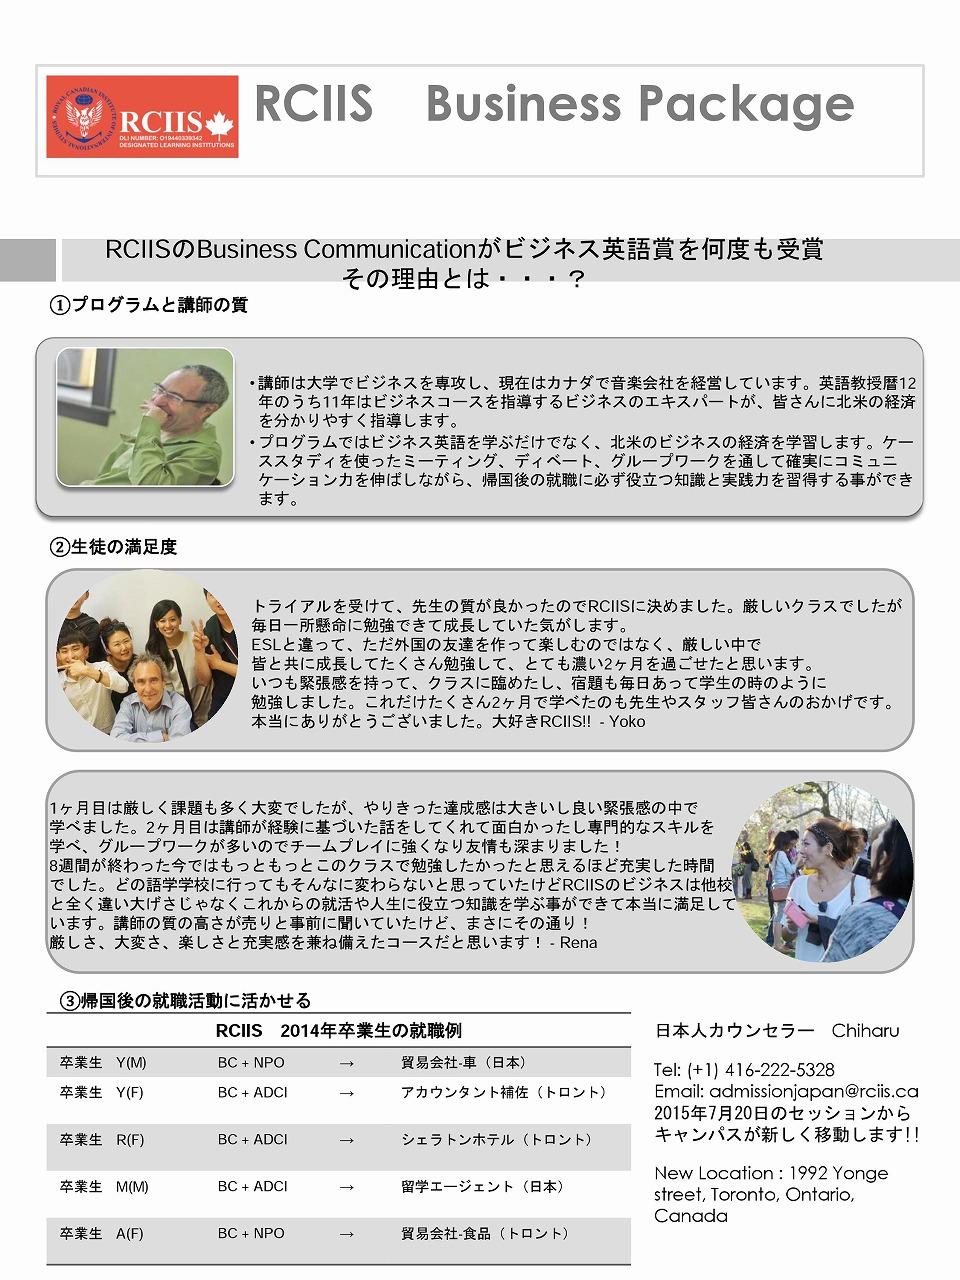 canada-ryugaku-toronto-esl-rciis-business-package-2